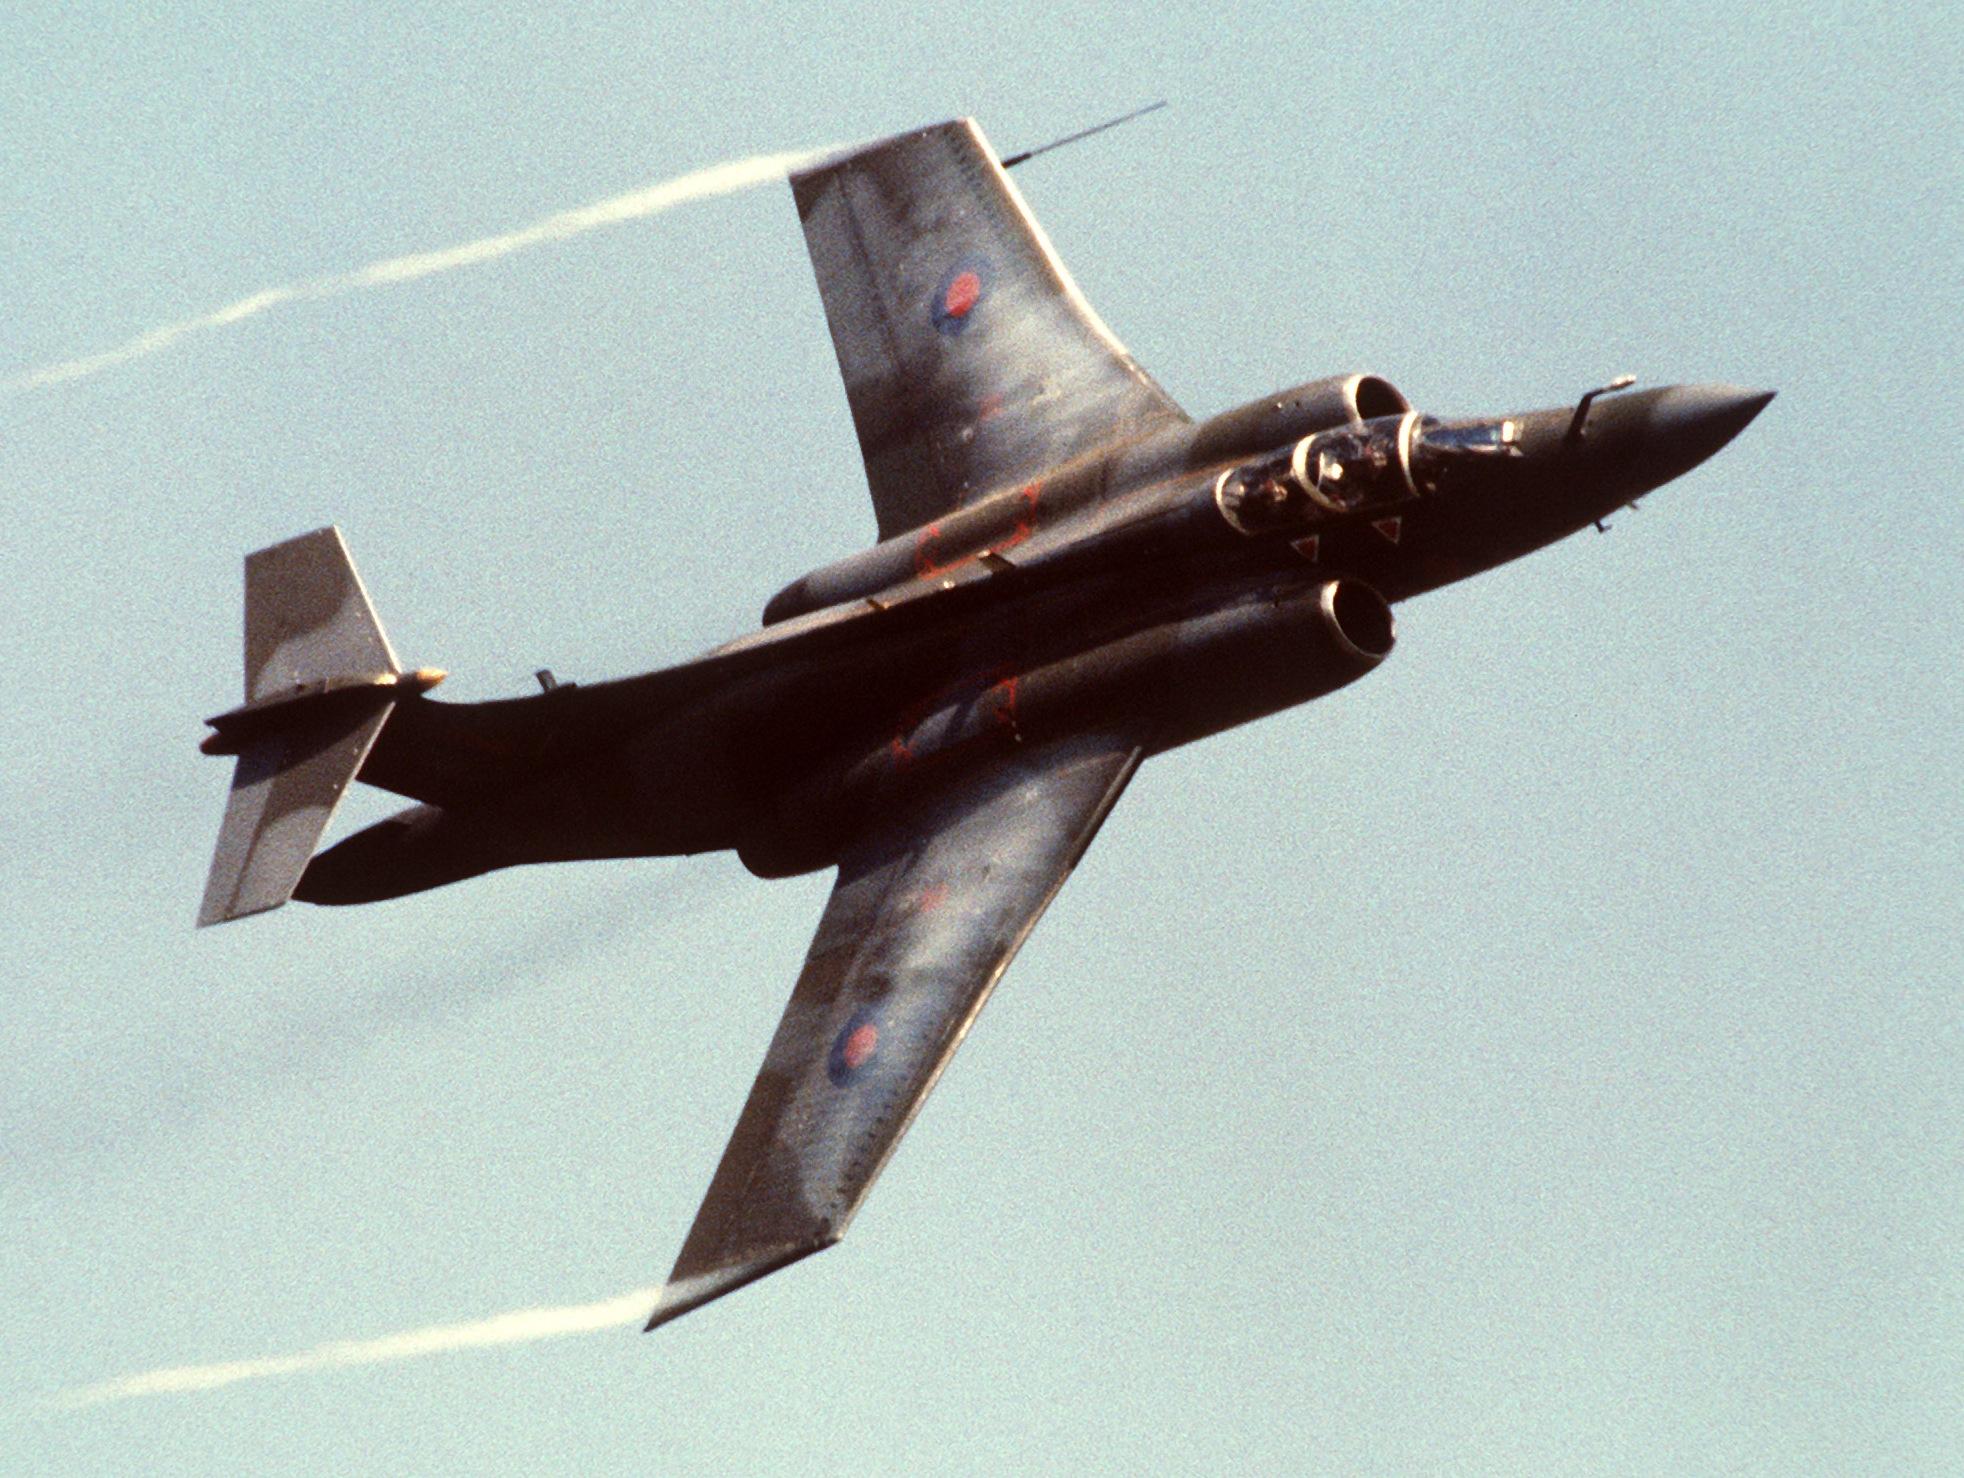 Buccaneer_S2B_Mildenhall_1988.jpeg